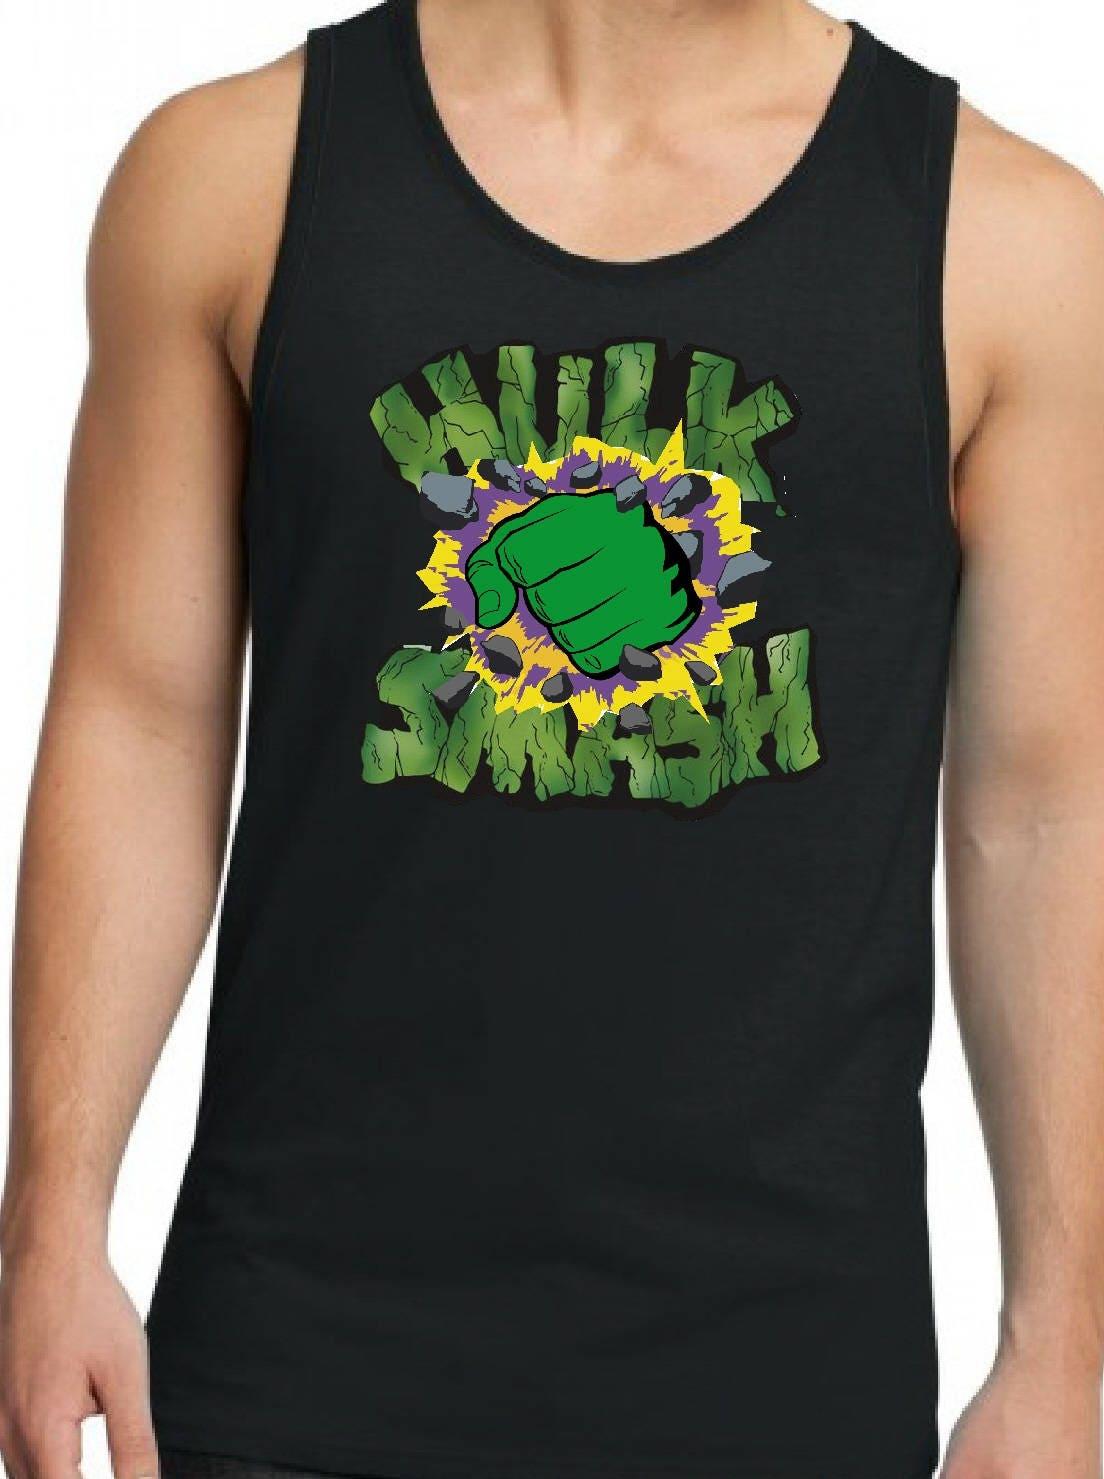 Incredible Hulk Men's Tank Top Guys Superhero Tank - photo#23